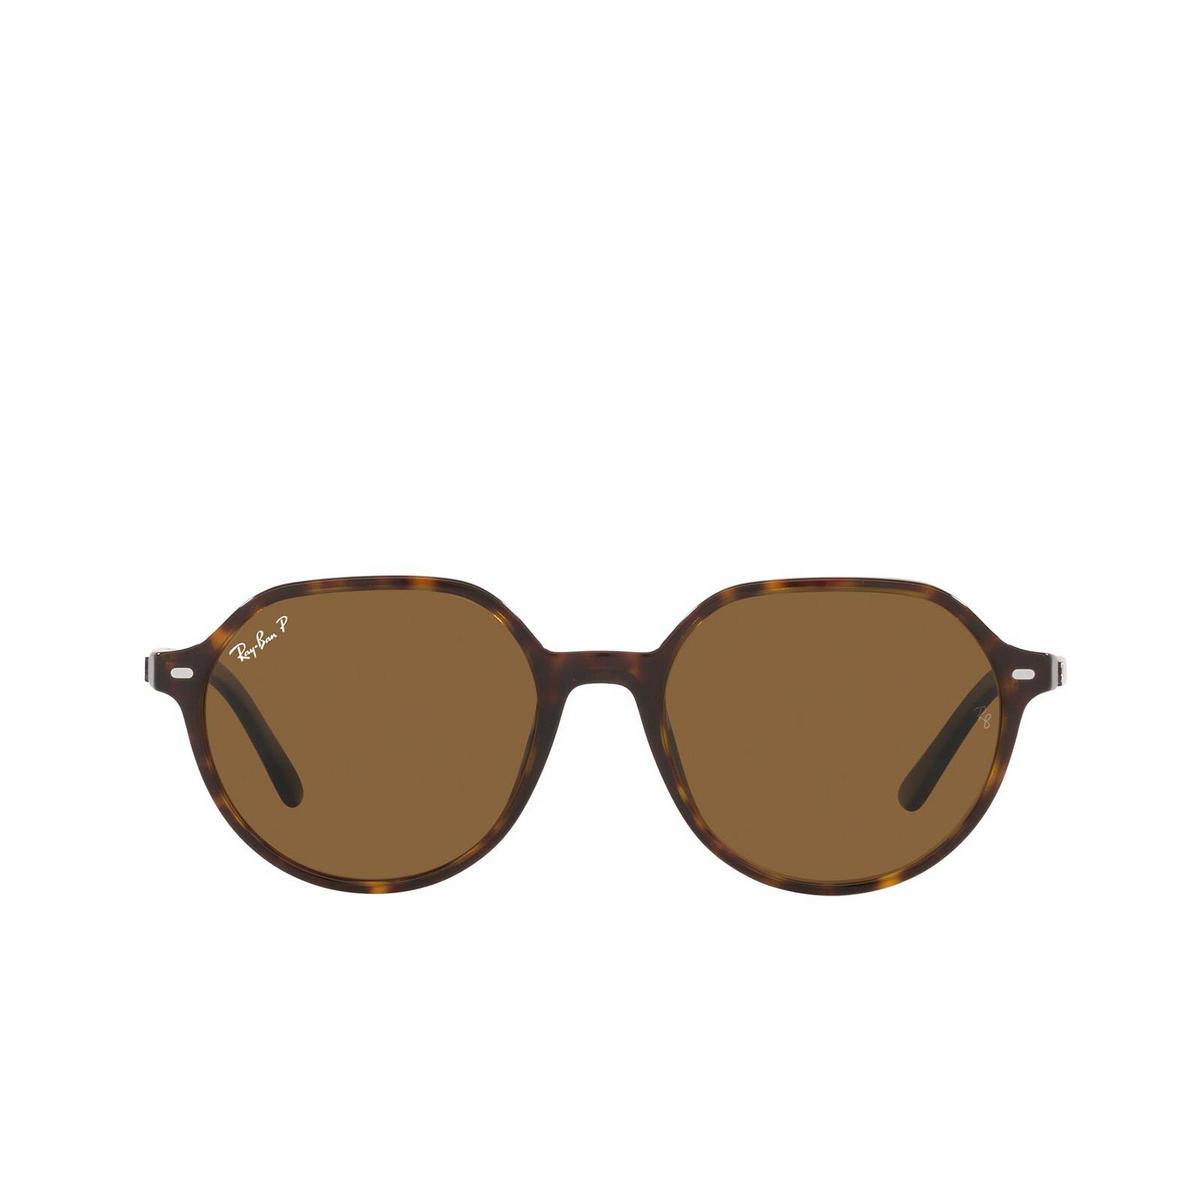 Ray-Ban® Irregular Sunglasses: Thalia RB2195 color Havana 902/57.